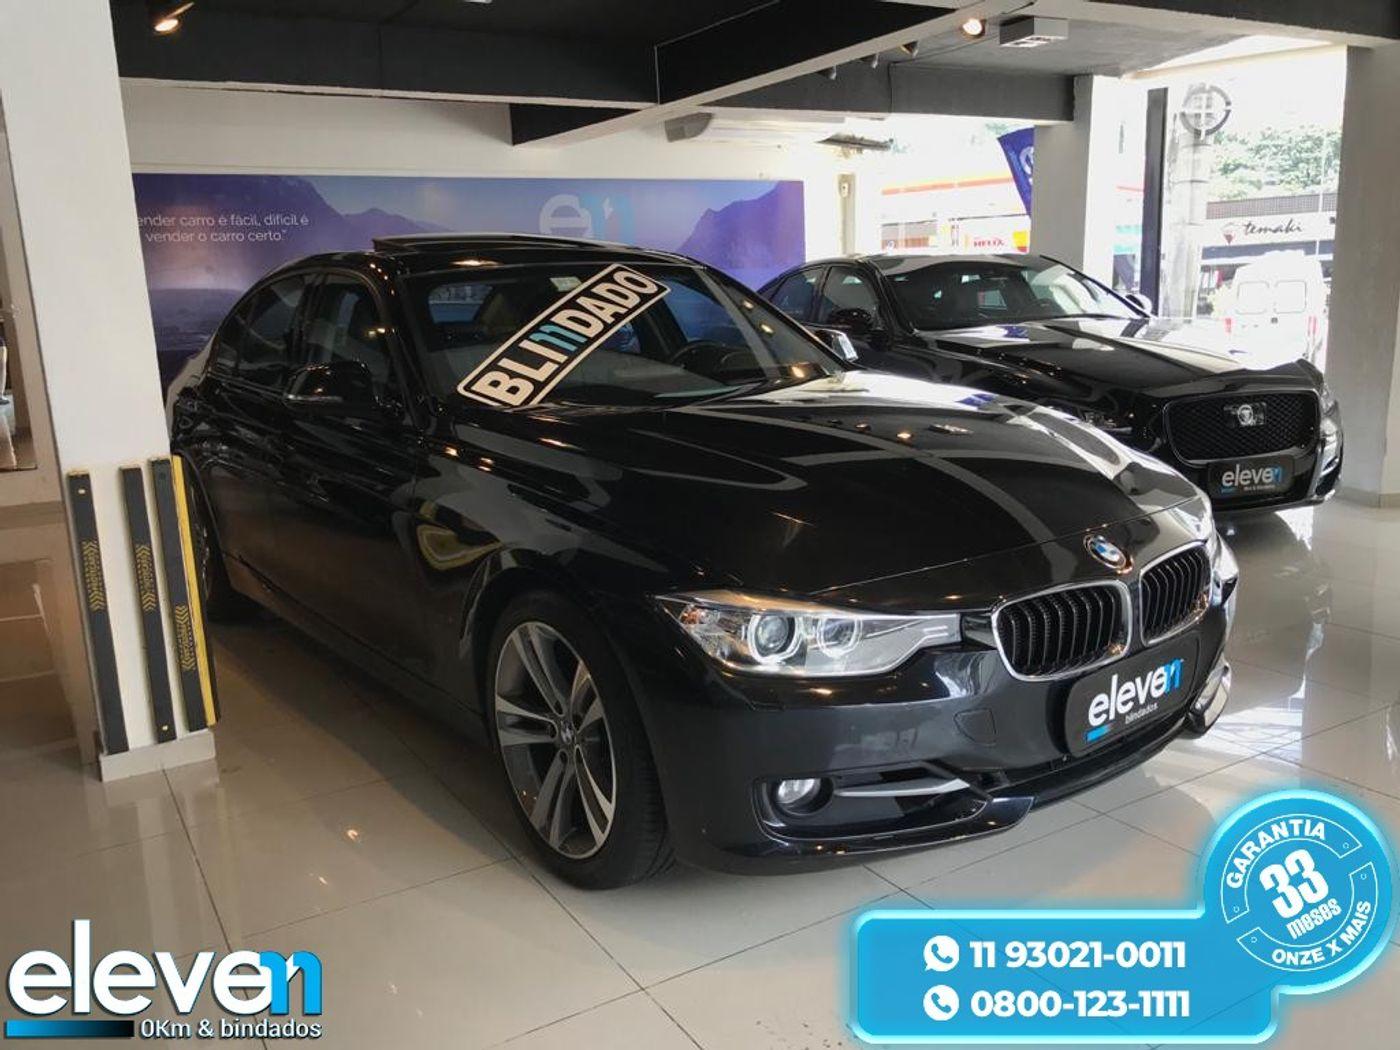 BMW 328iA GT M Sport 2.0 Turbo 16V 245cv 5p